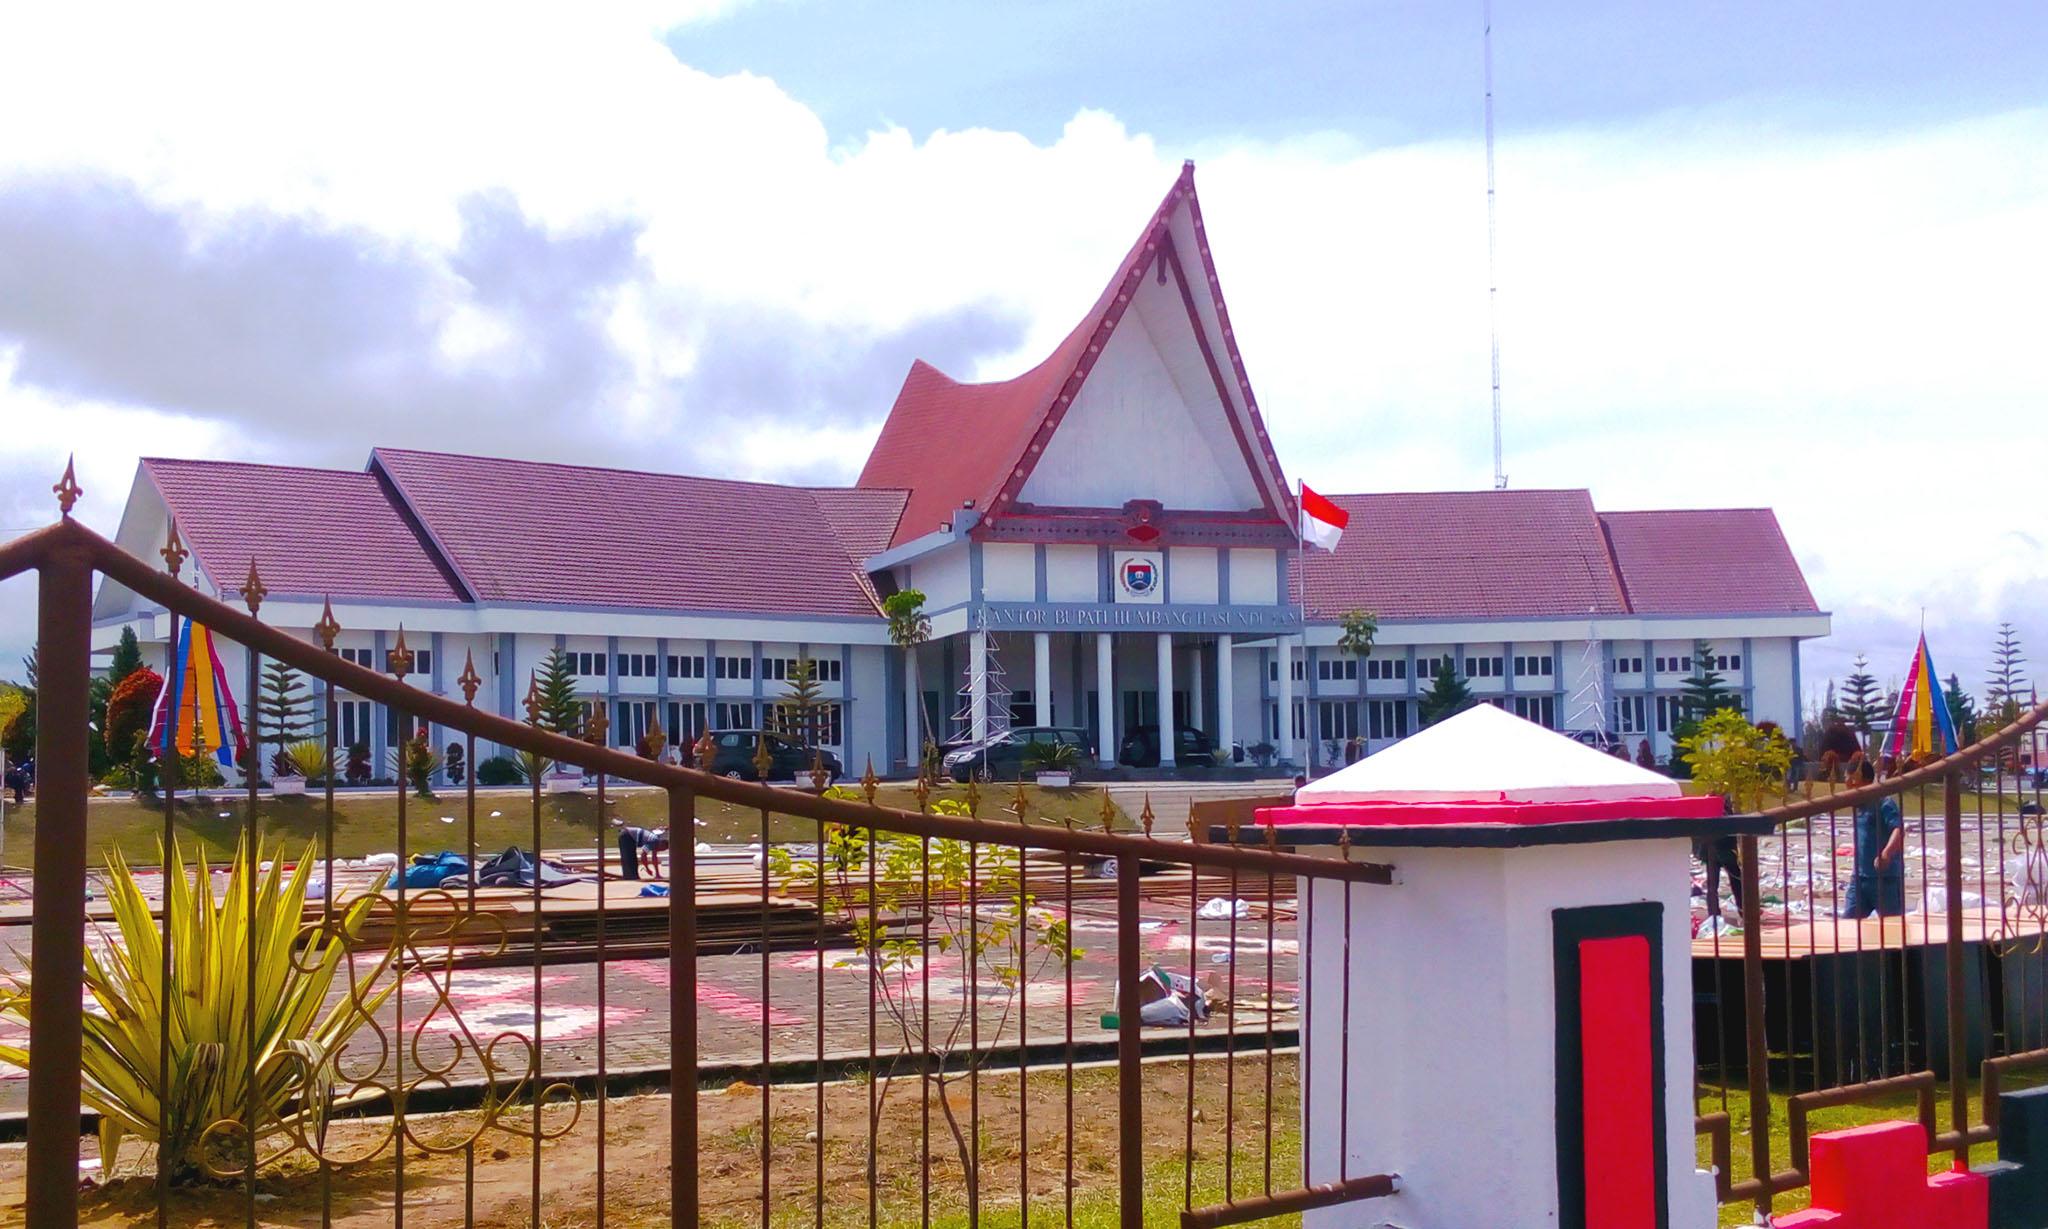 File Kabupaten Humbang Hasundutan Sumatra Utara 01 Jpg Wikimedia Commons